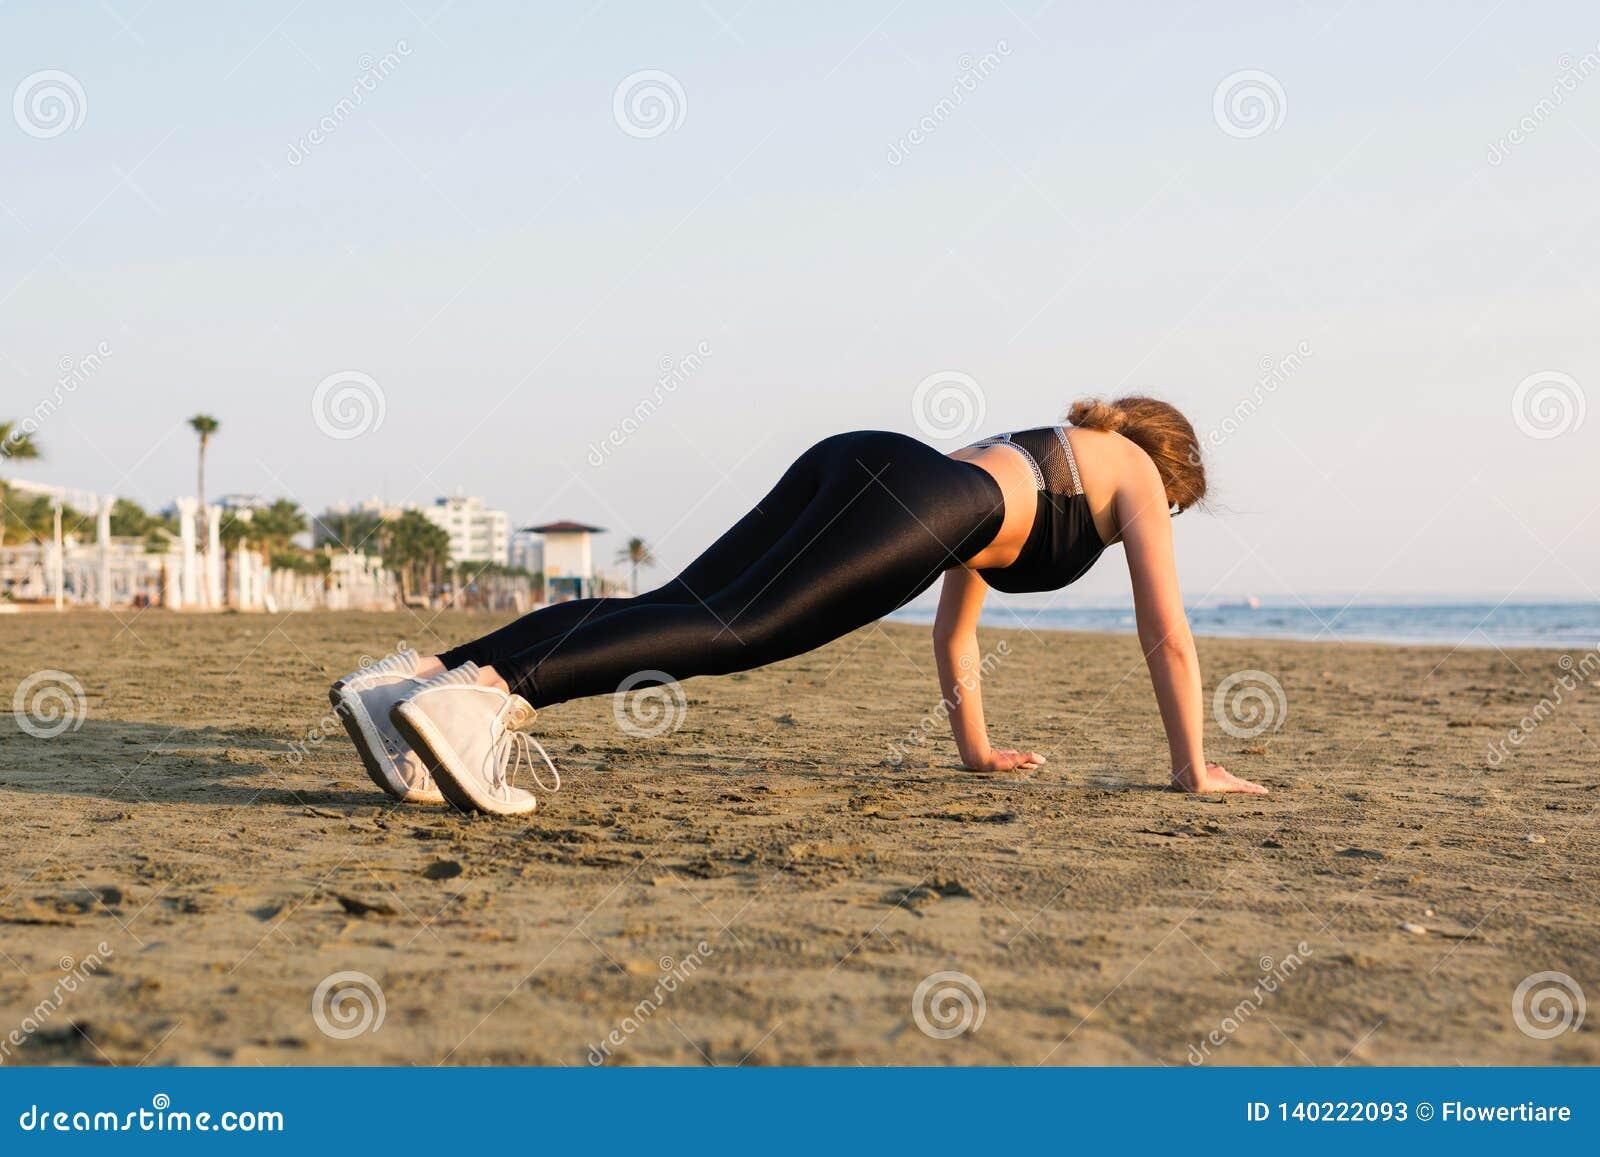 Young woman doing pushups on beach.